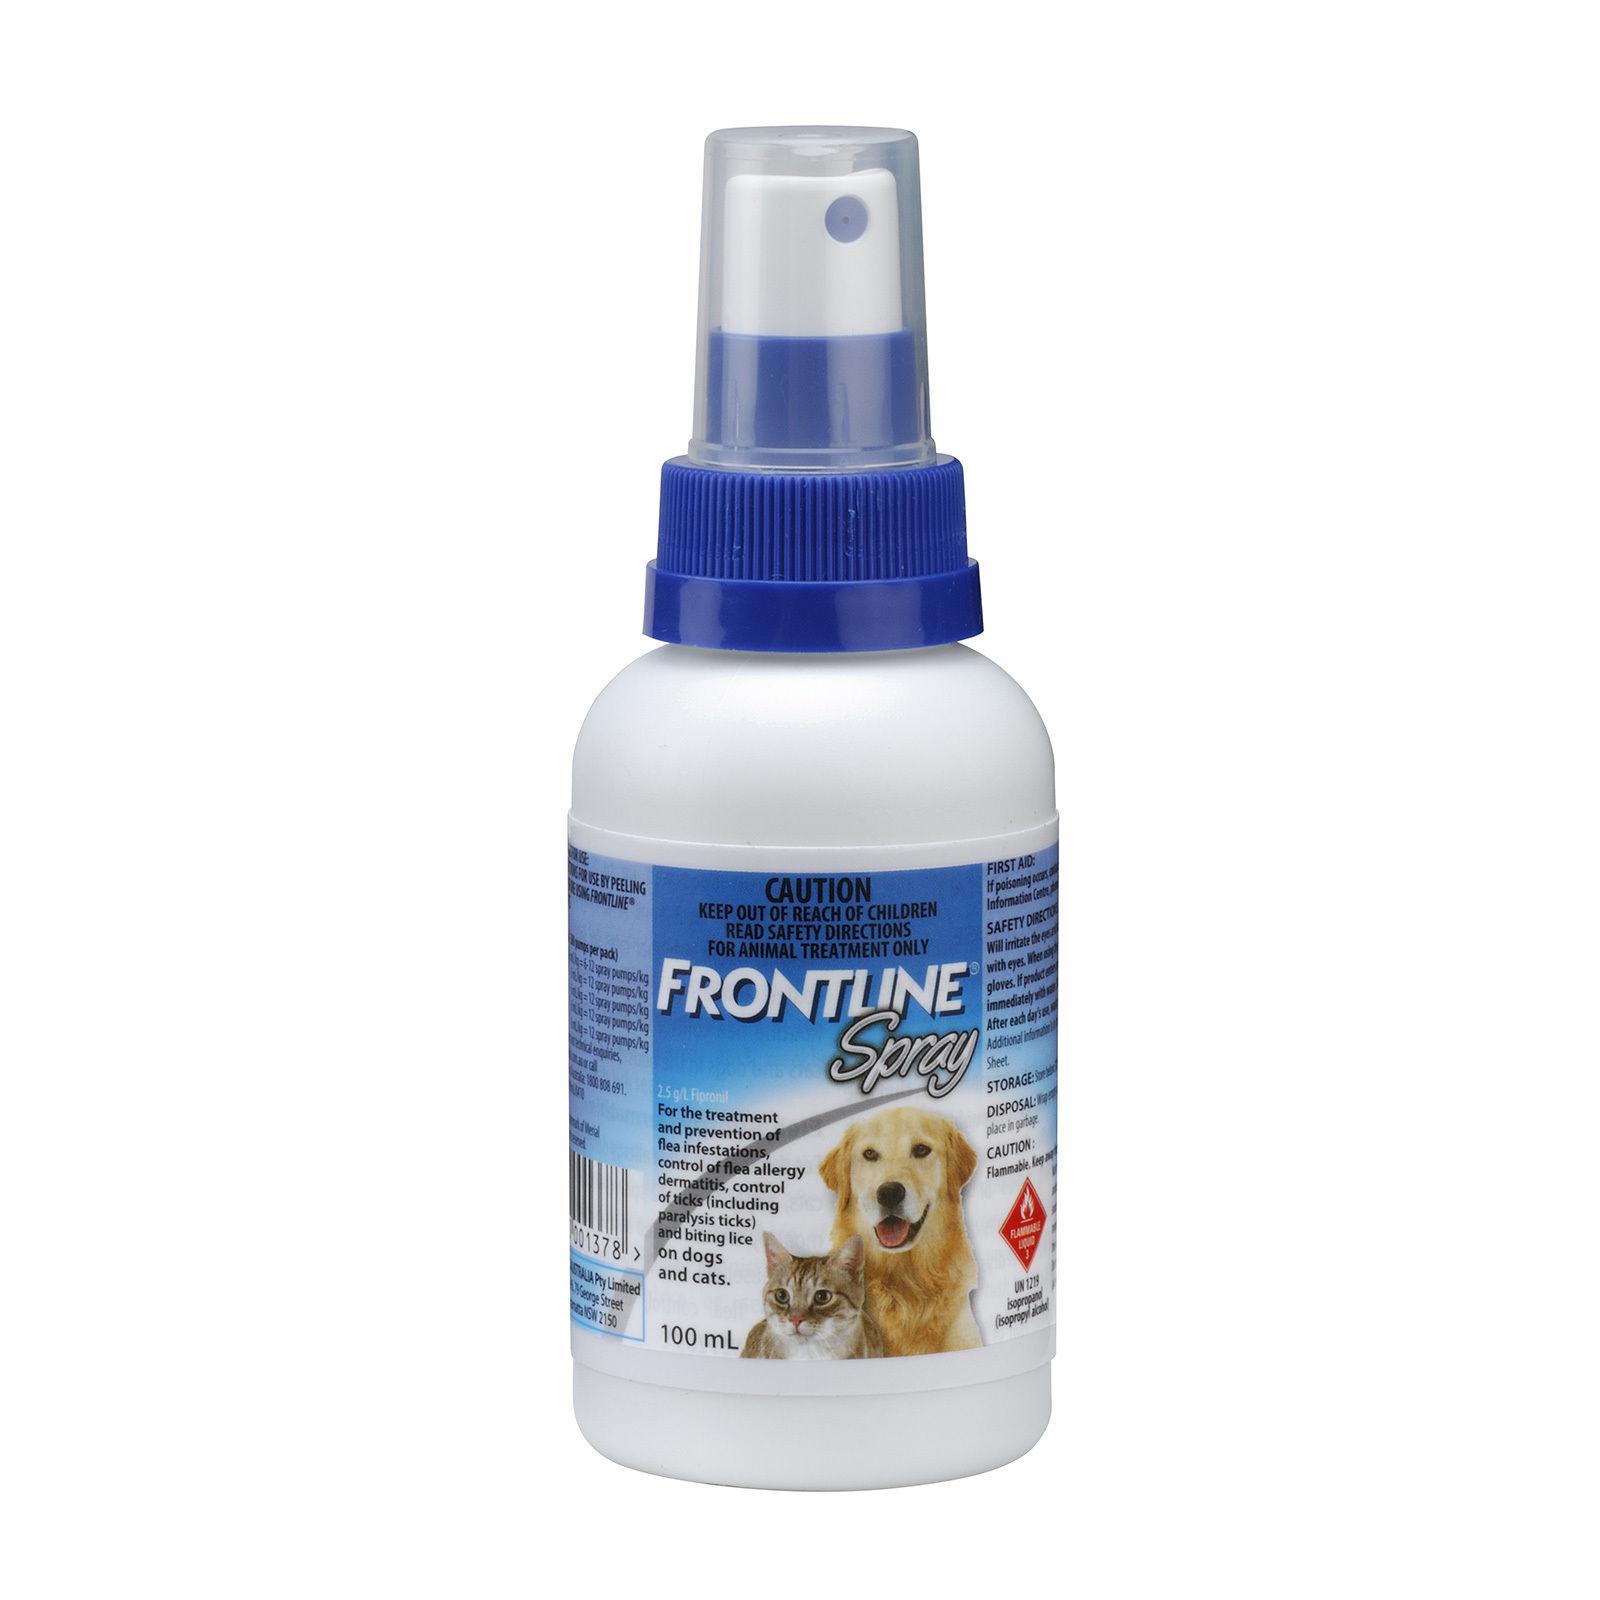 Frontline Spray for Dogs : Buy Frontline Spray - PetCareSupplies.com